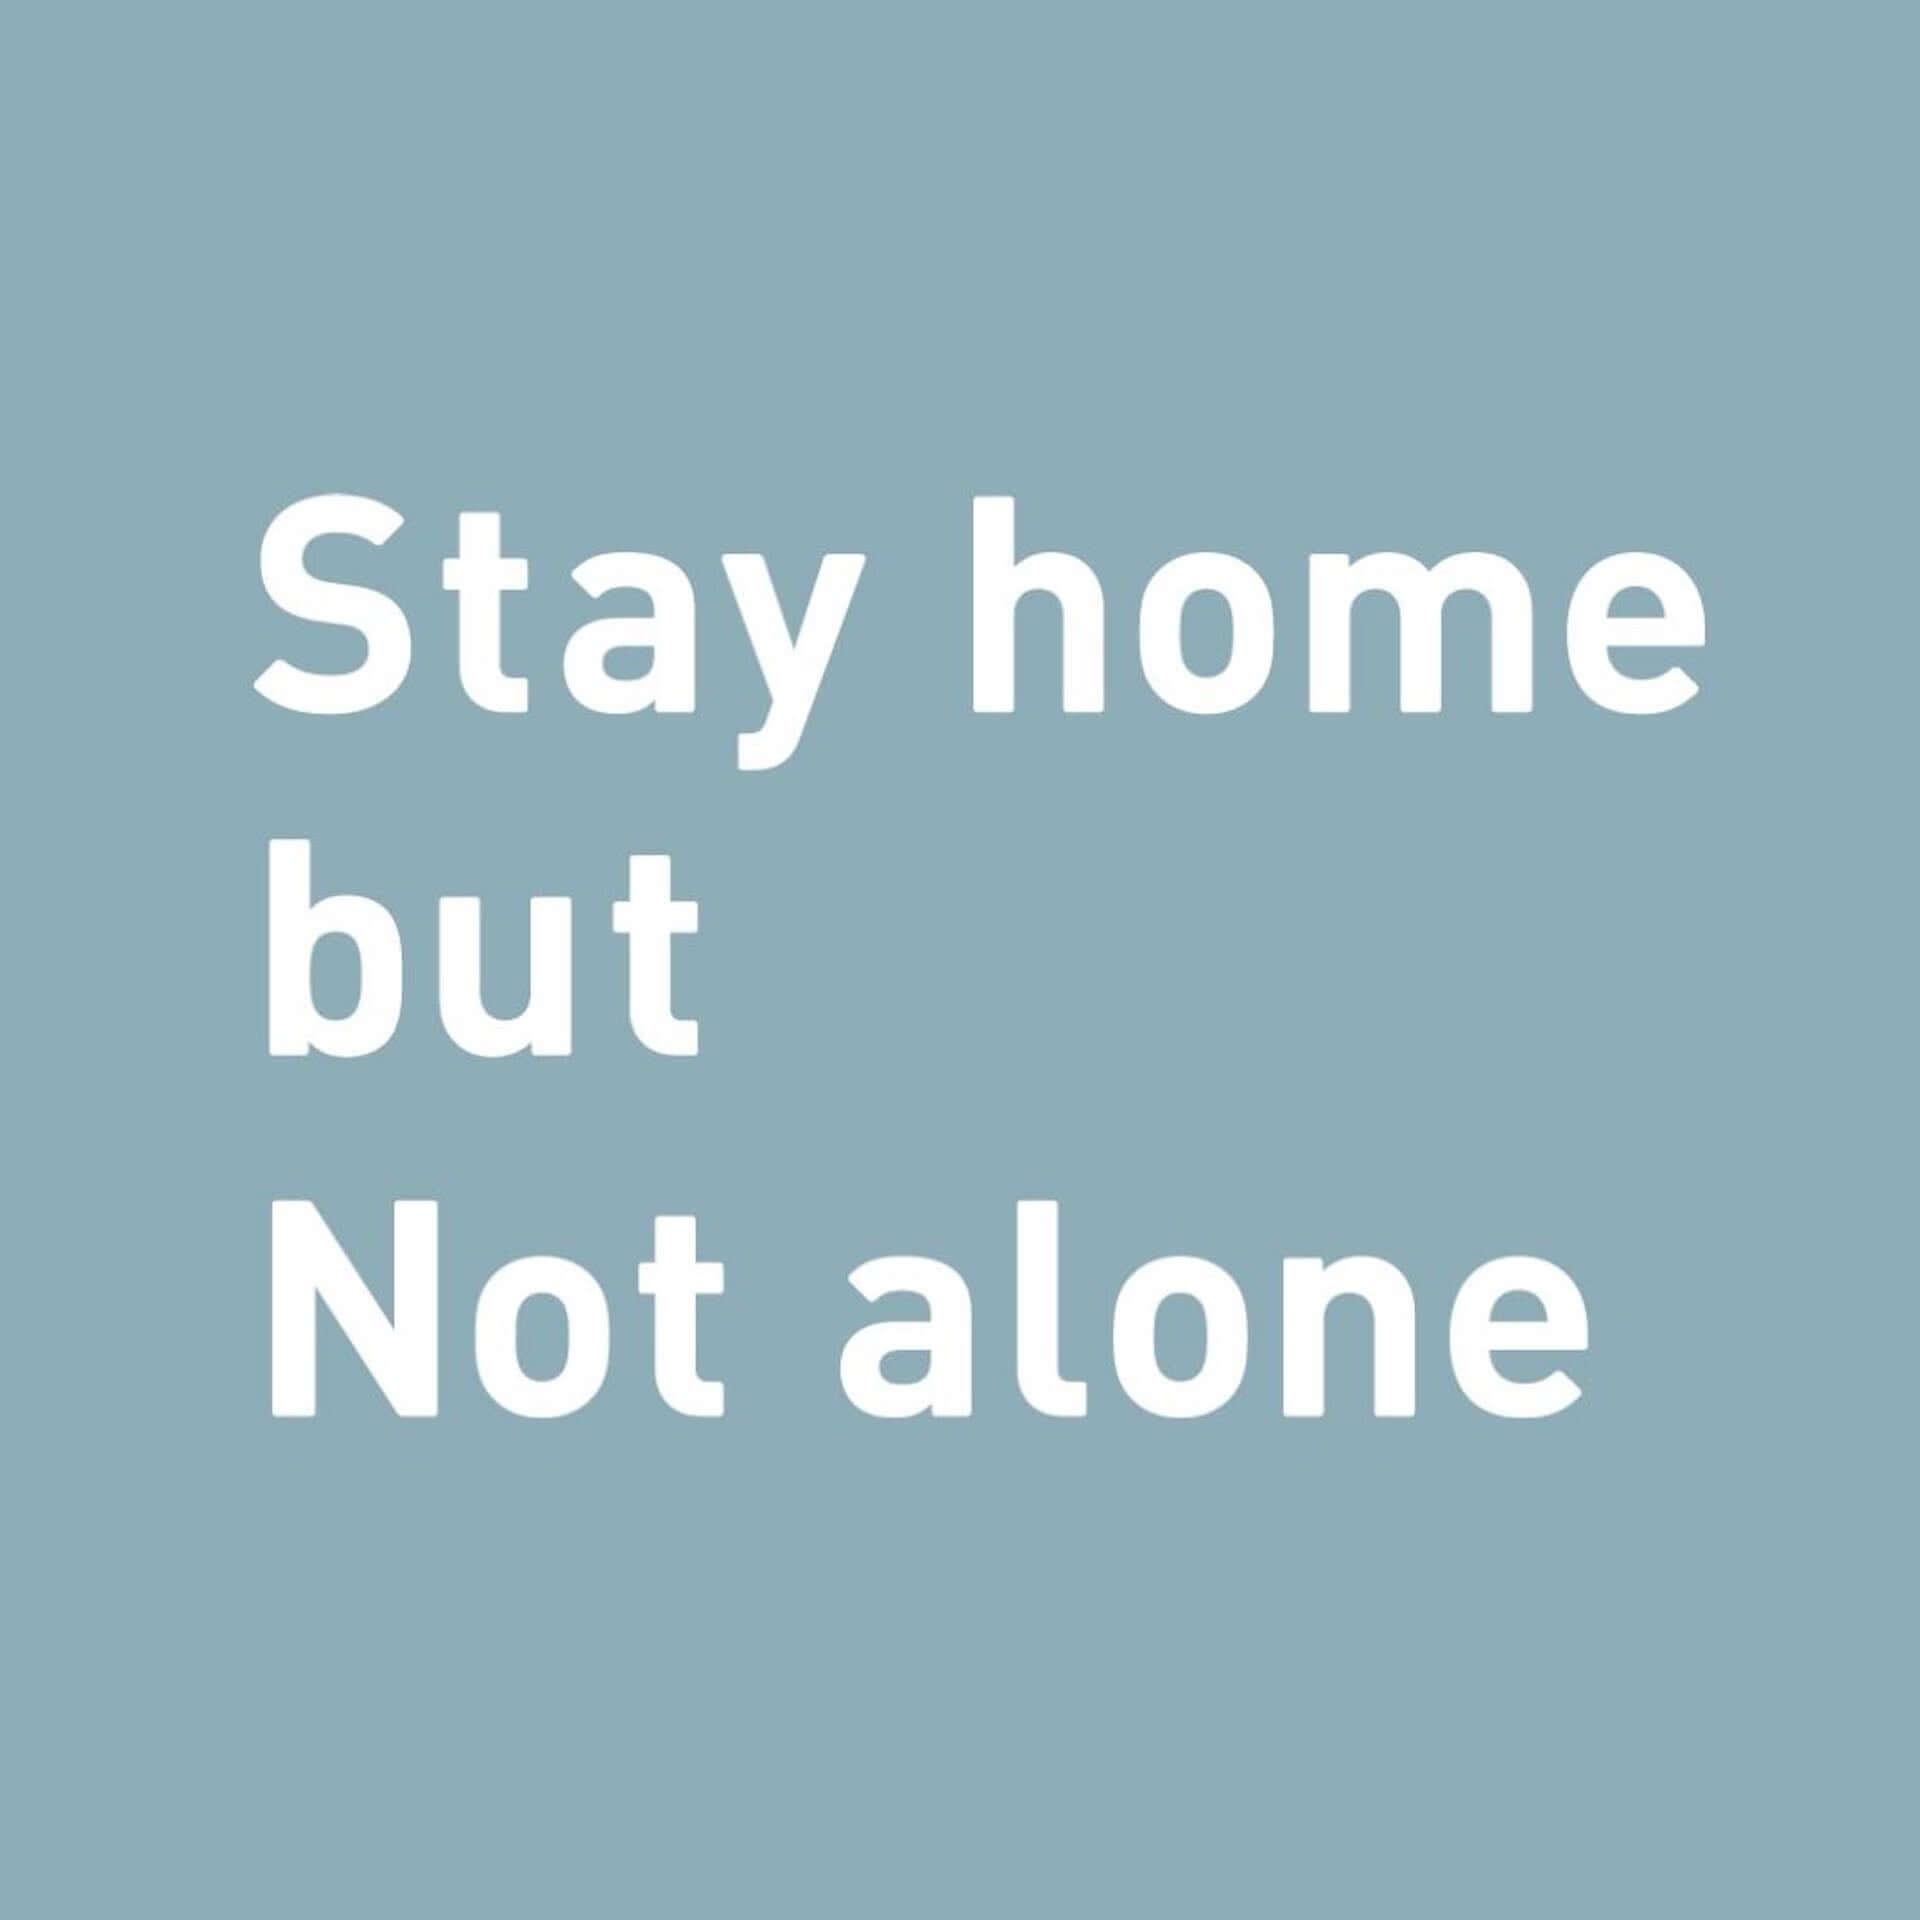 (THE)LIVING ROOM STUDIOによるプロジェクト「Stay home but Not alone」が始動|フリーランスのクリエイターによるデザインTシャツが販売 life200406_stayhome_1-1920x1920